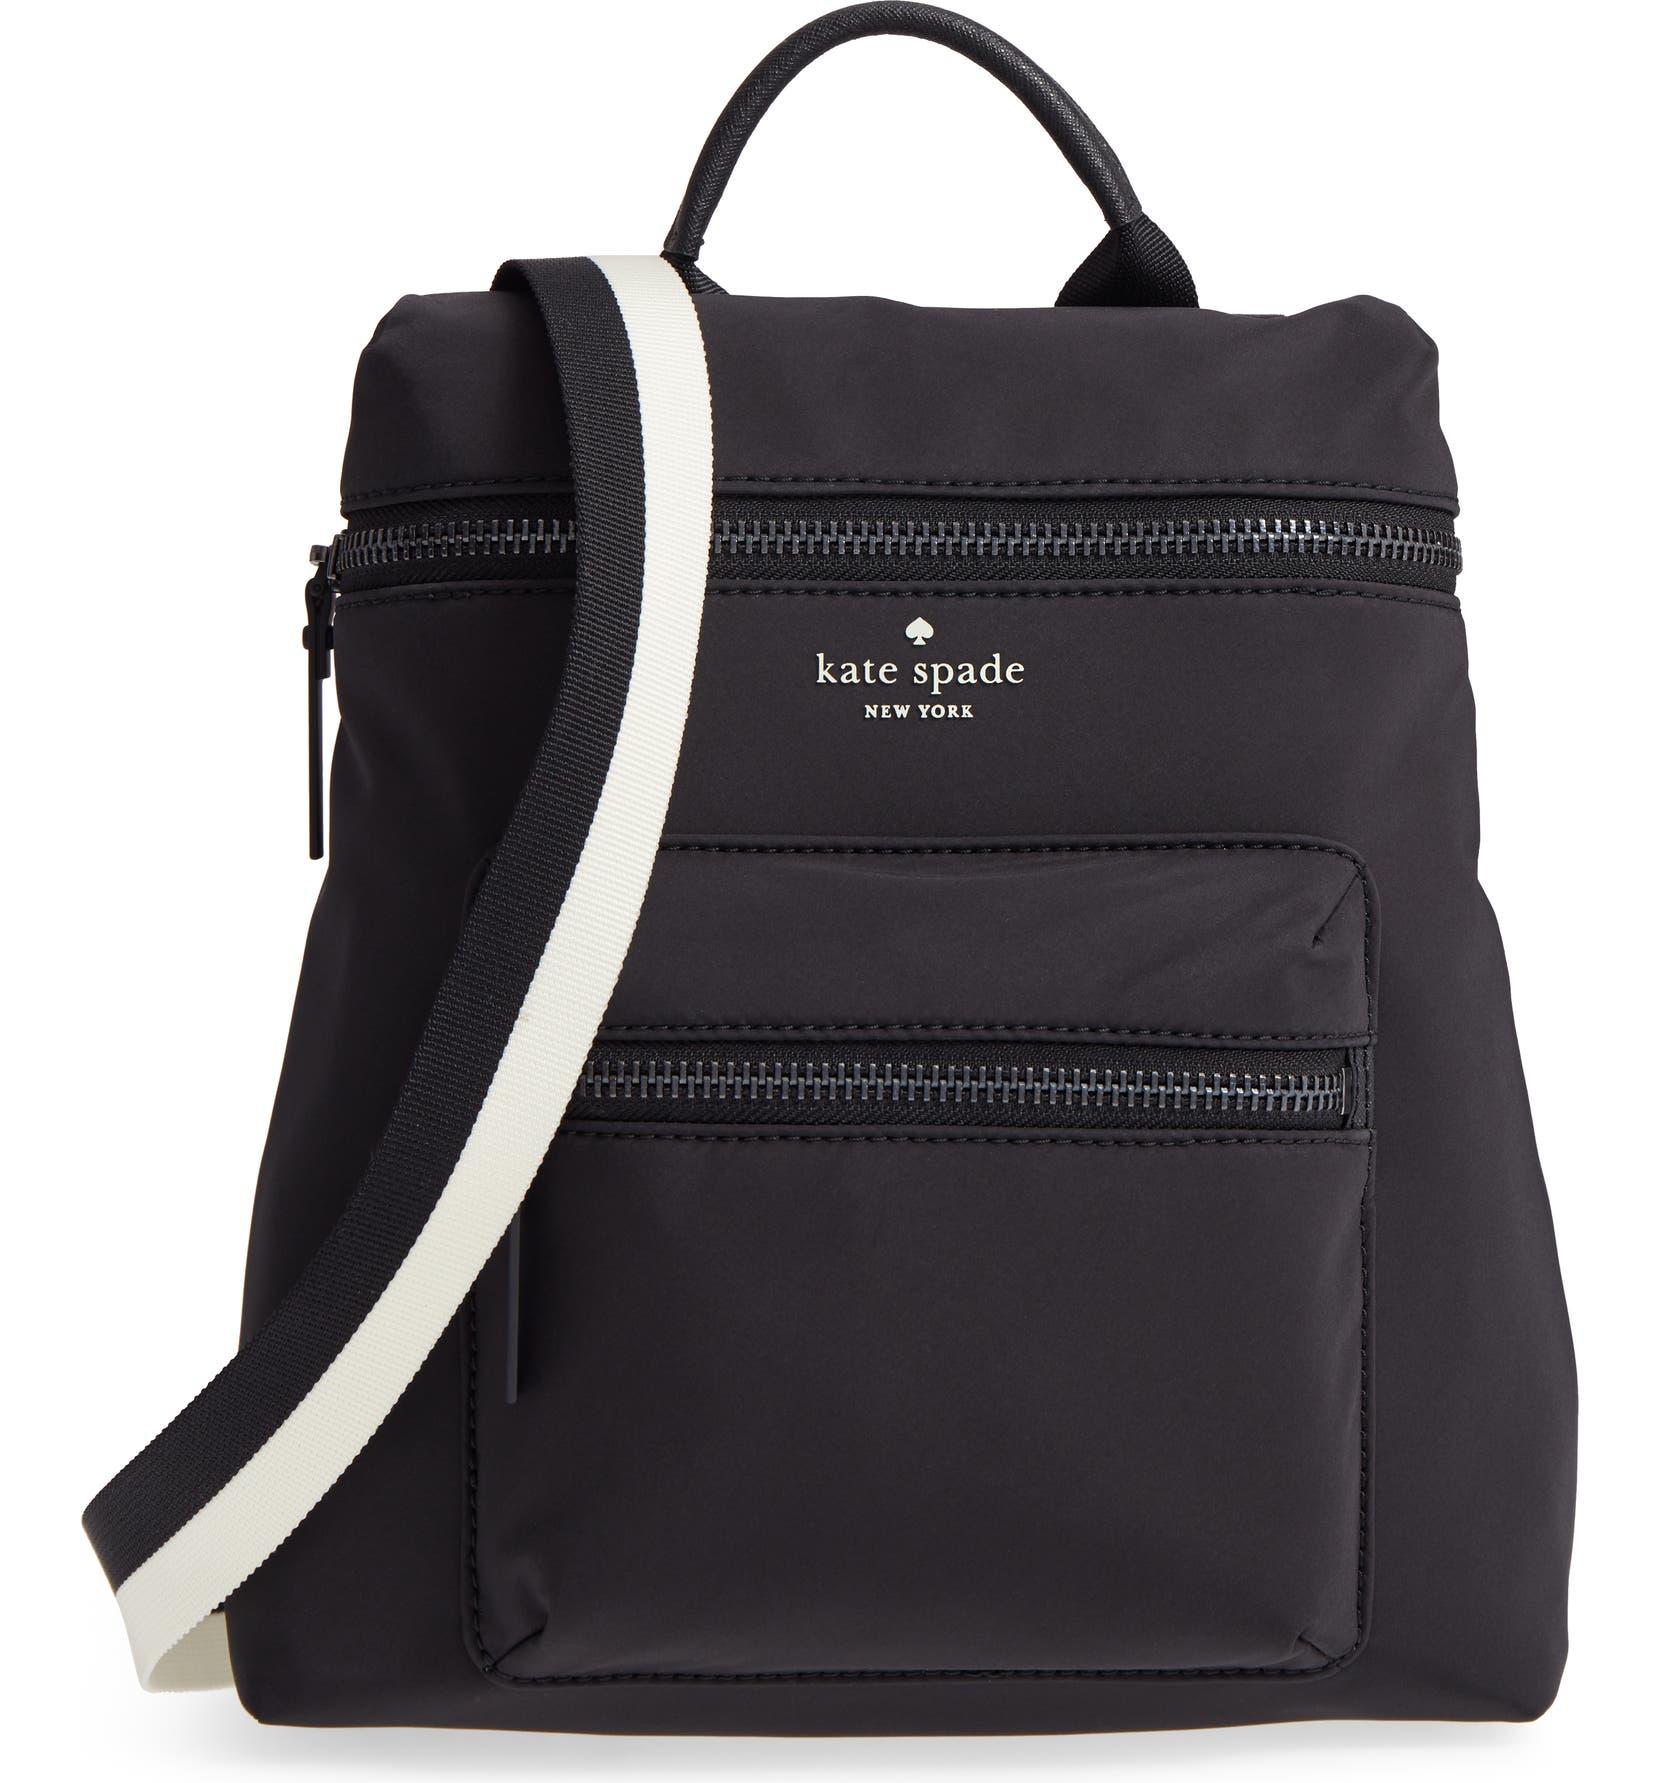 ff92ed1314b9 kate spade new york that s the spirit mini nylon convertible backpack